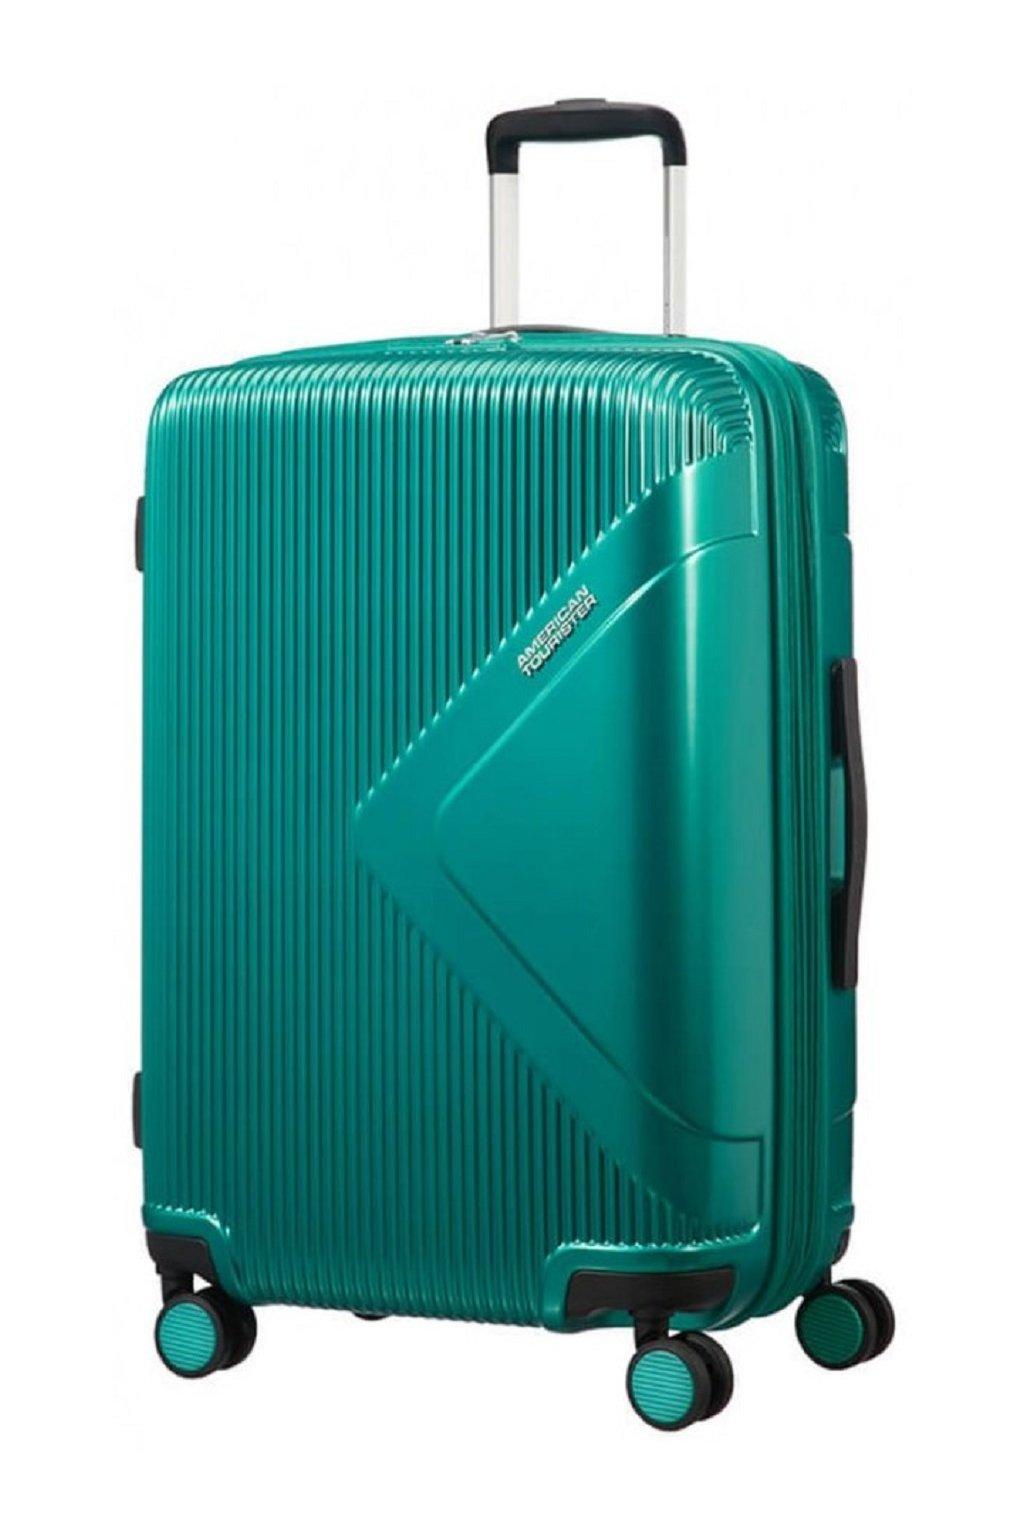 kufrland americantourister modern dream at 69cm 7081 liter expandable emerald green